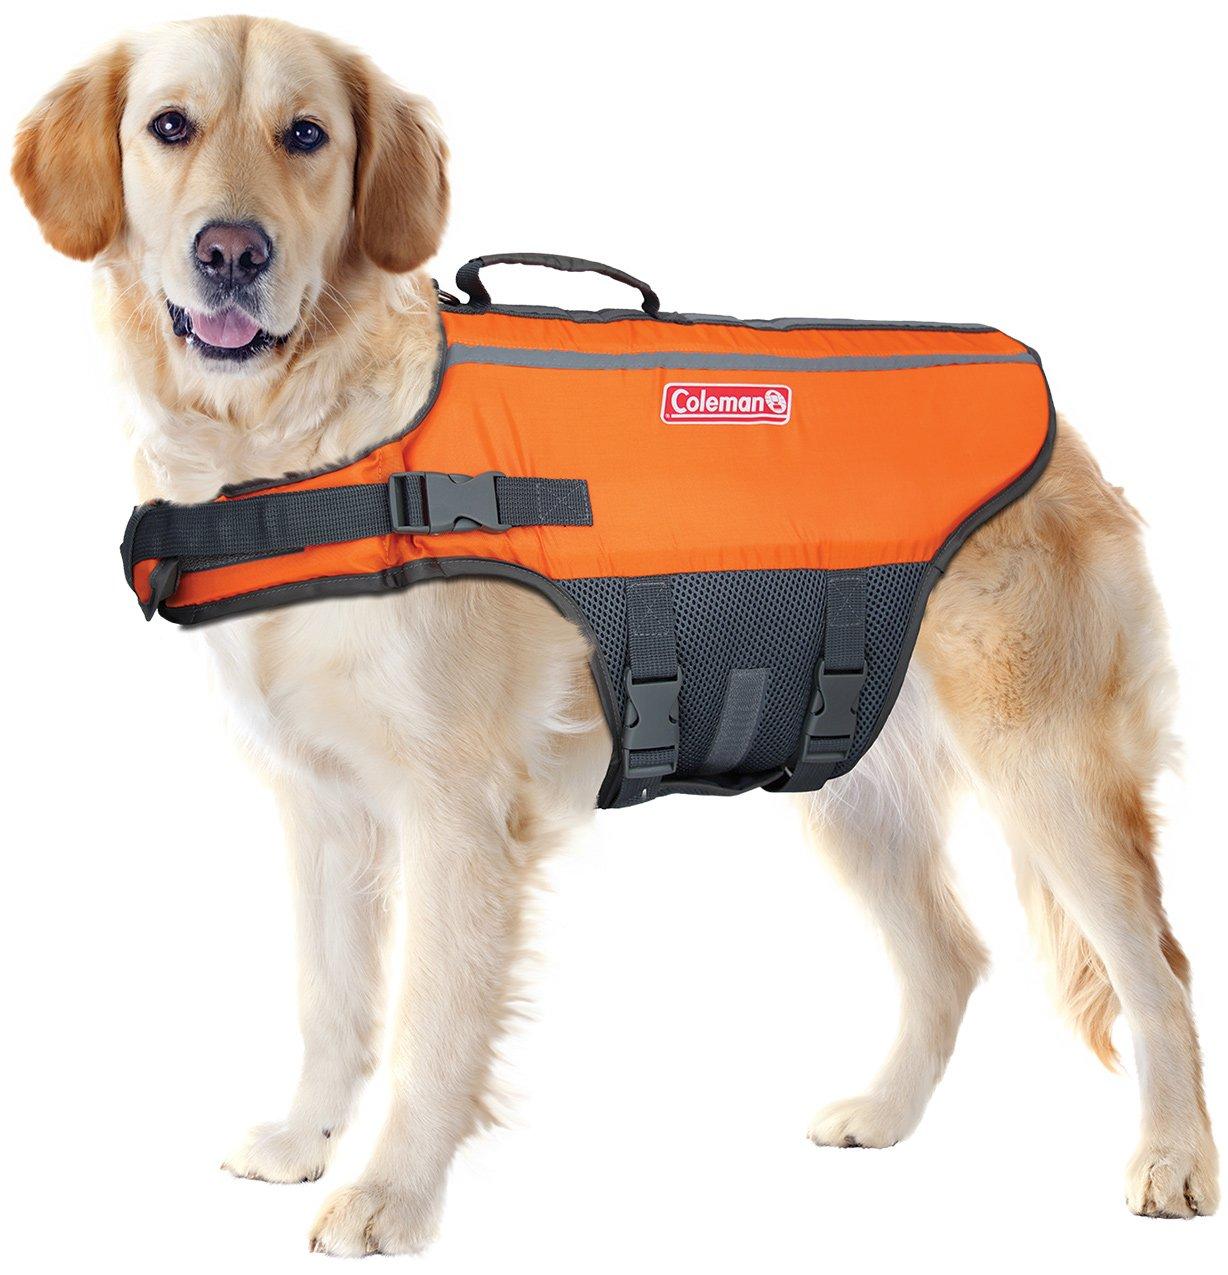 Coleman Dog Life Jacket Vest for Flotation in Pool Boat Beach Lake